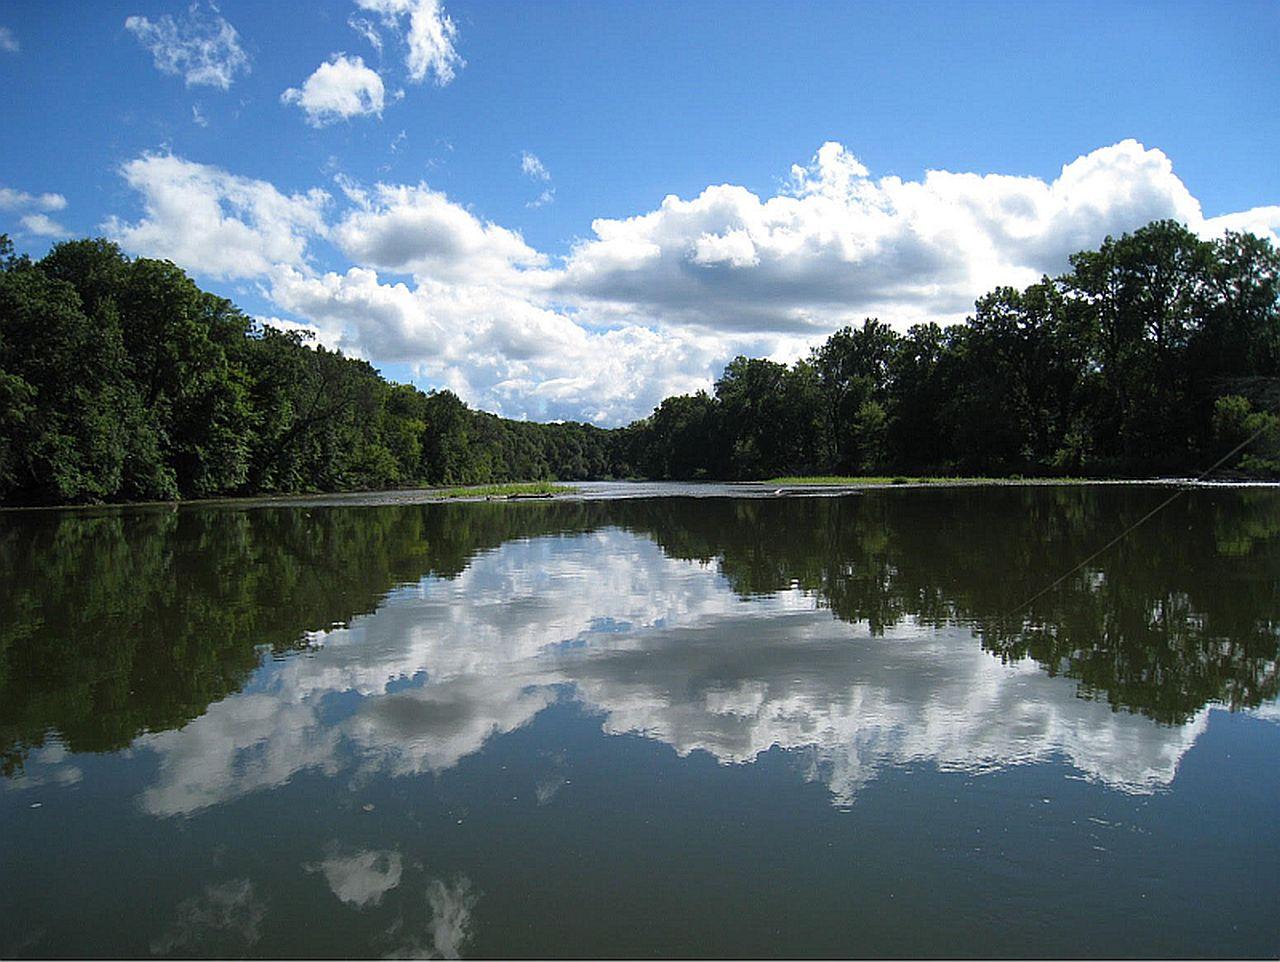 Fox River near Silver Springs July 2020 by Tom Schrader